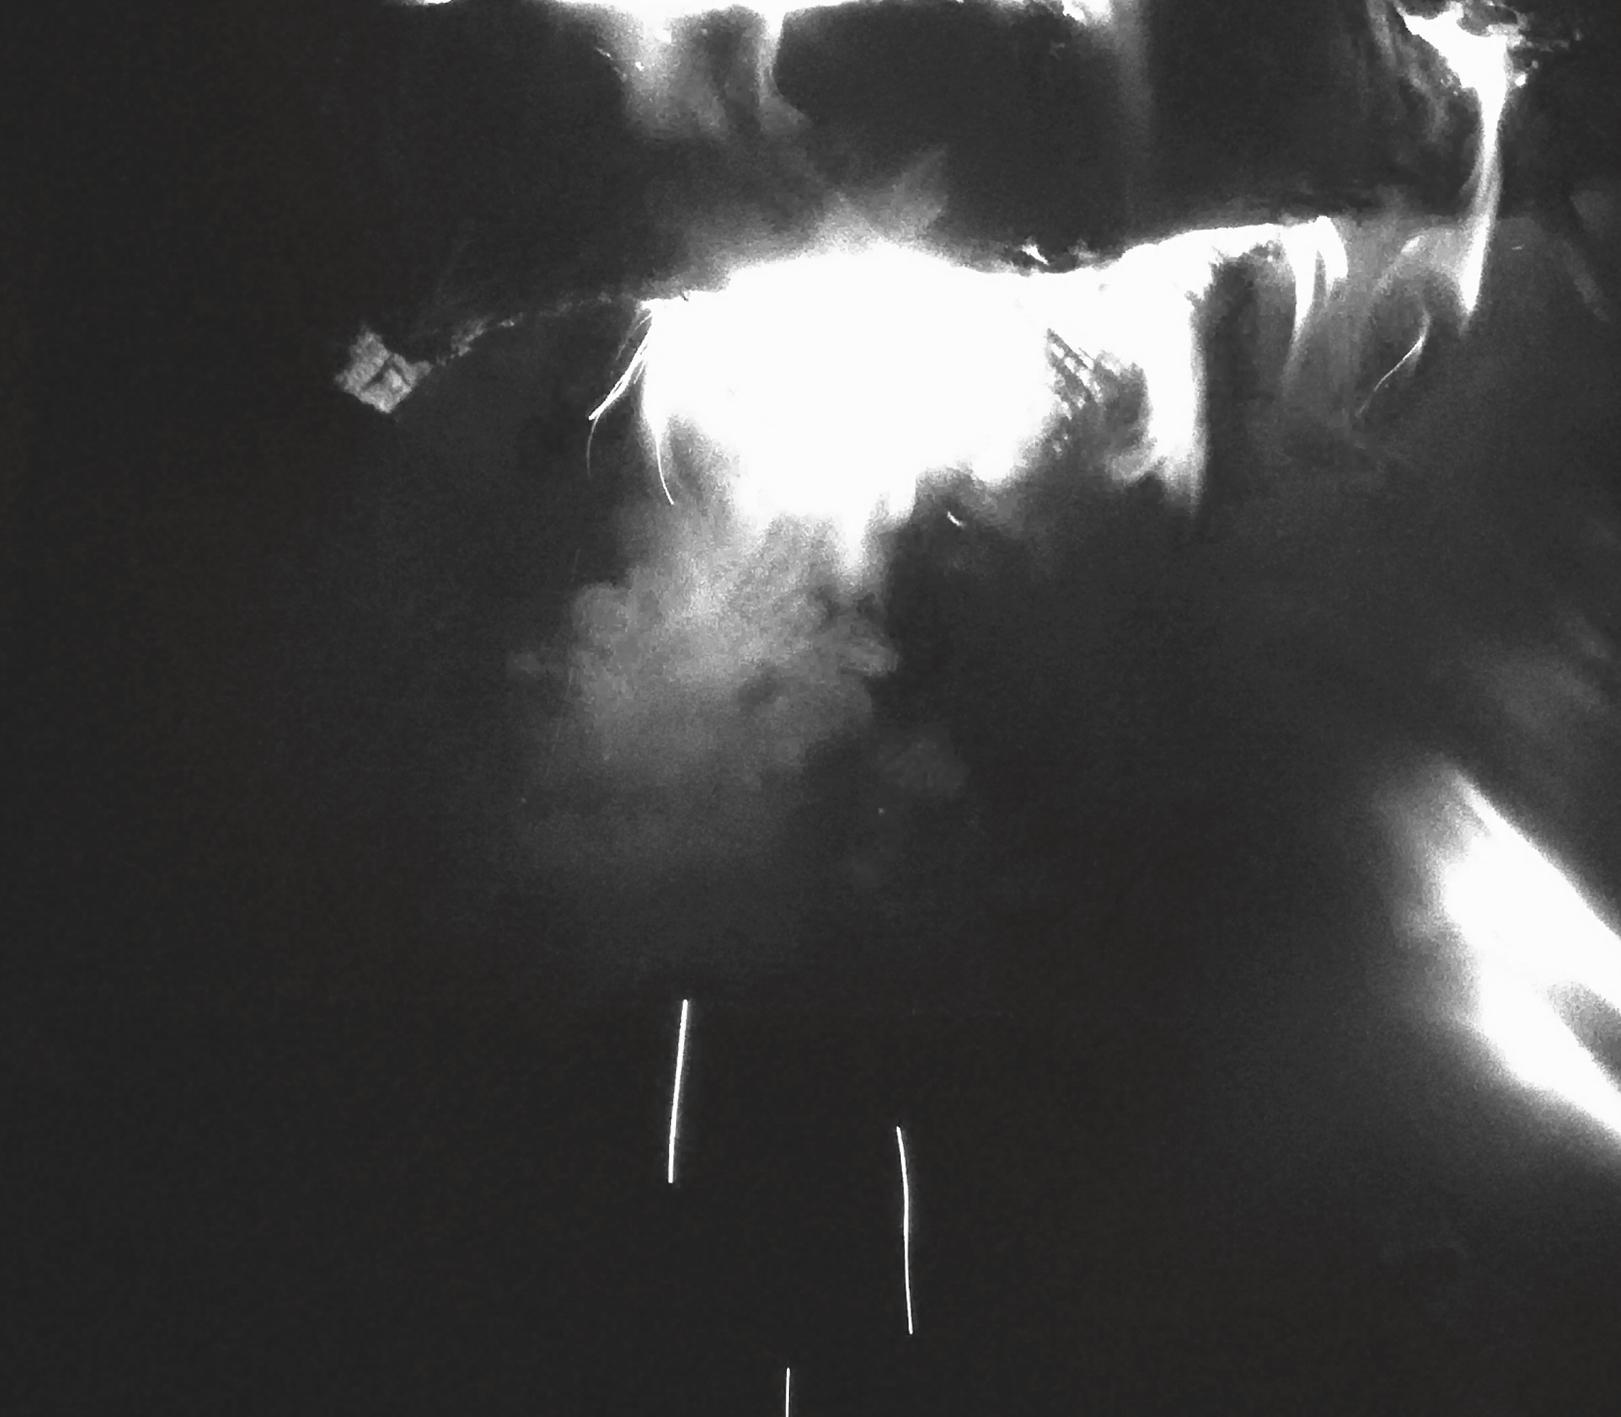 Vimana - Nuovo album per i Folwark